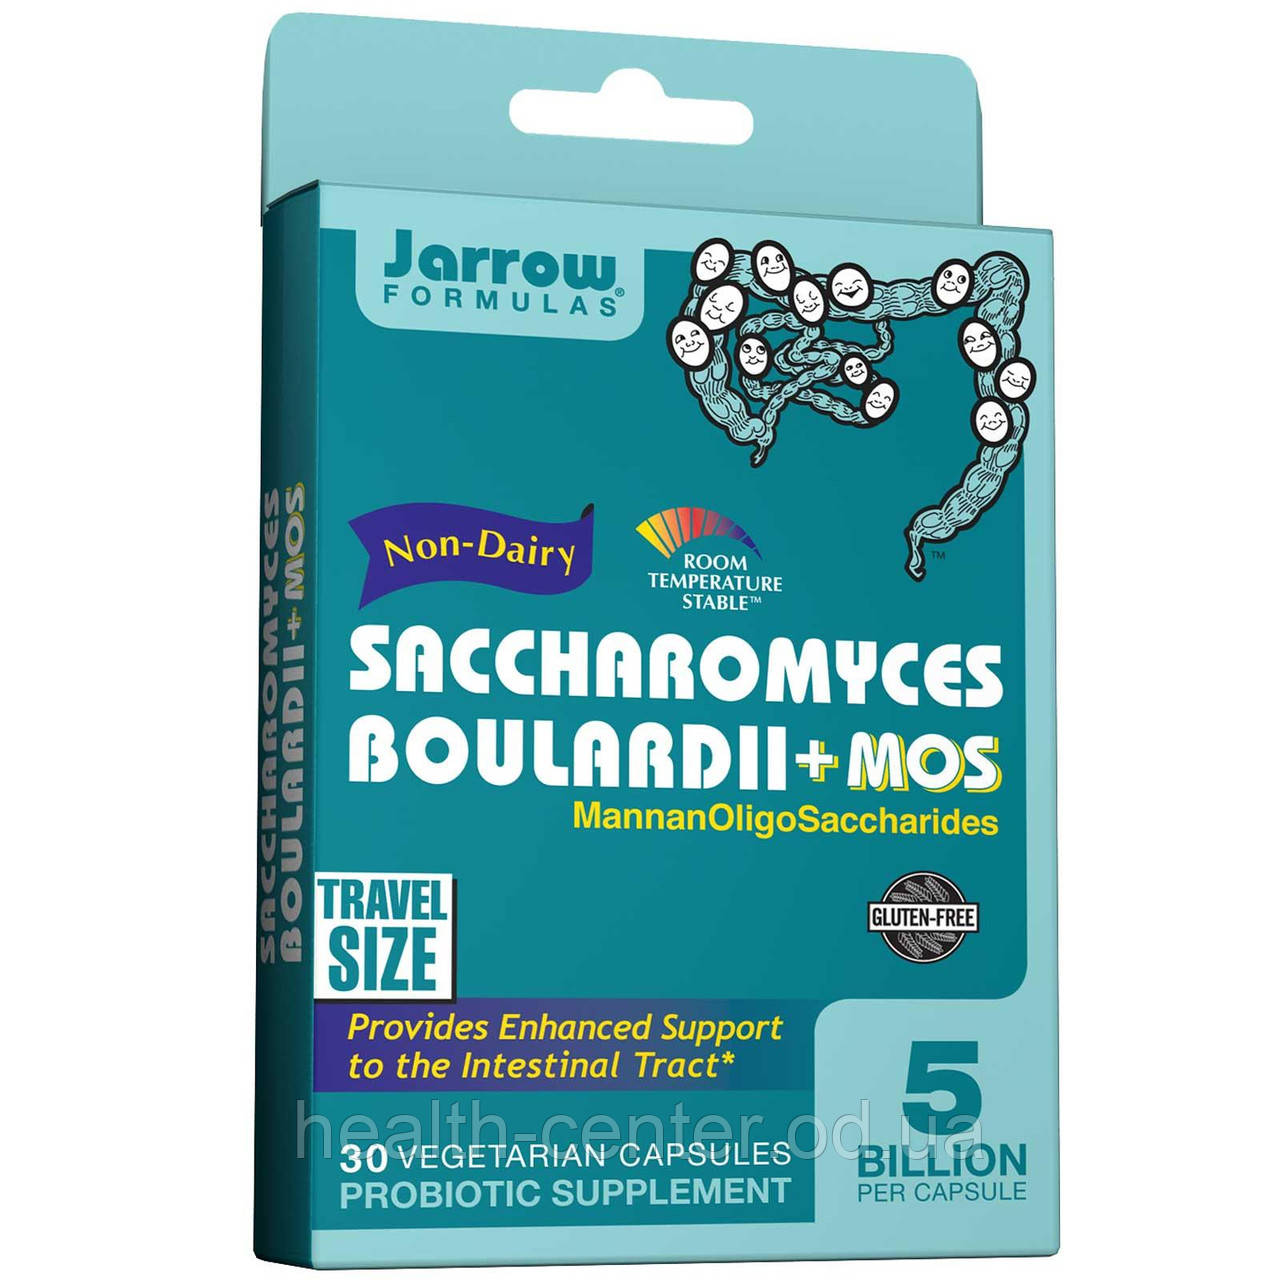 Сахаромицеты буларди + МОС (энтерол) 5 млрд 30 капс лечение кандидоза диареи  метеоризма Jarrow Formulas USA